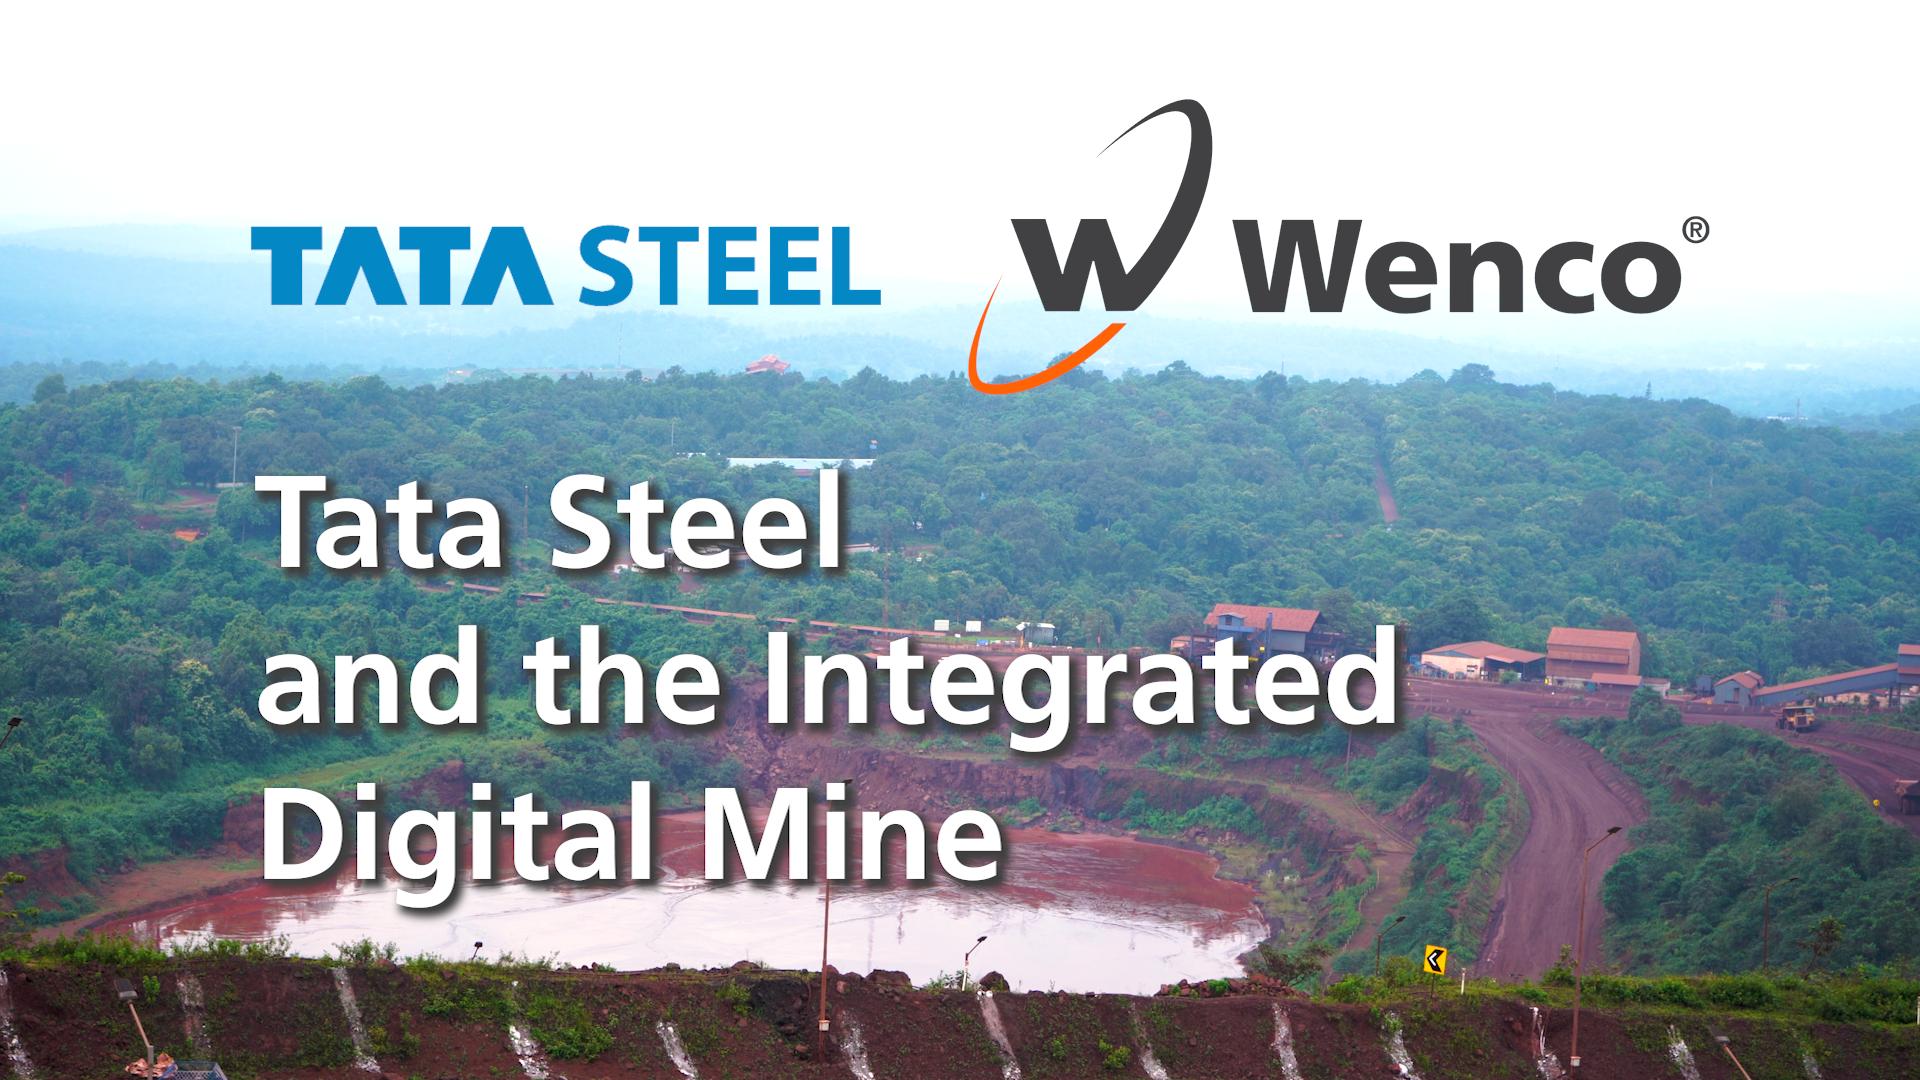 Tata Steel and the Integrated Digital Mine